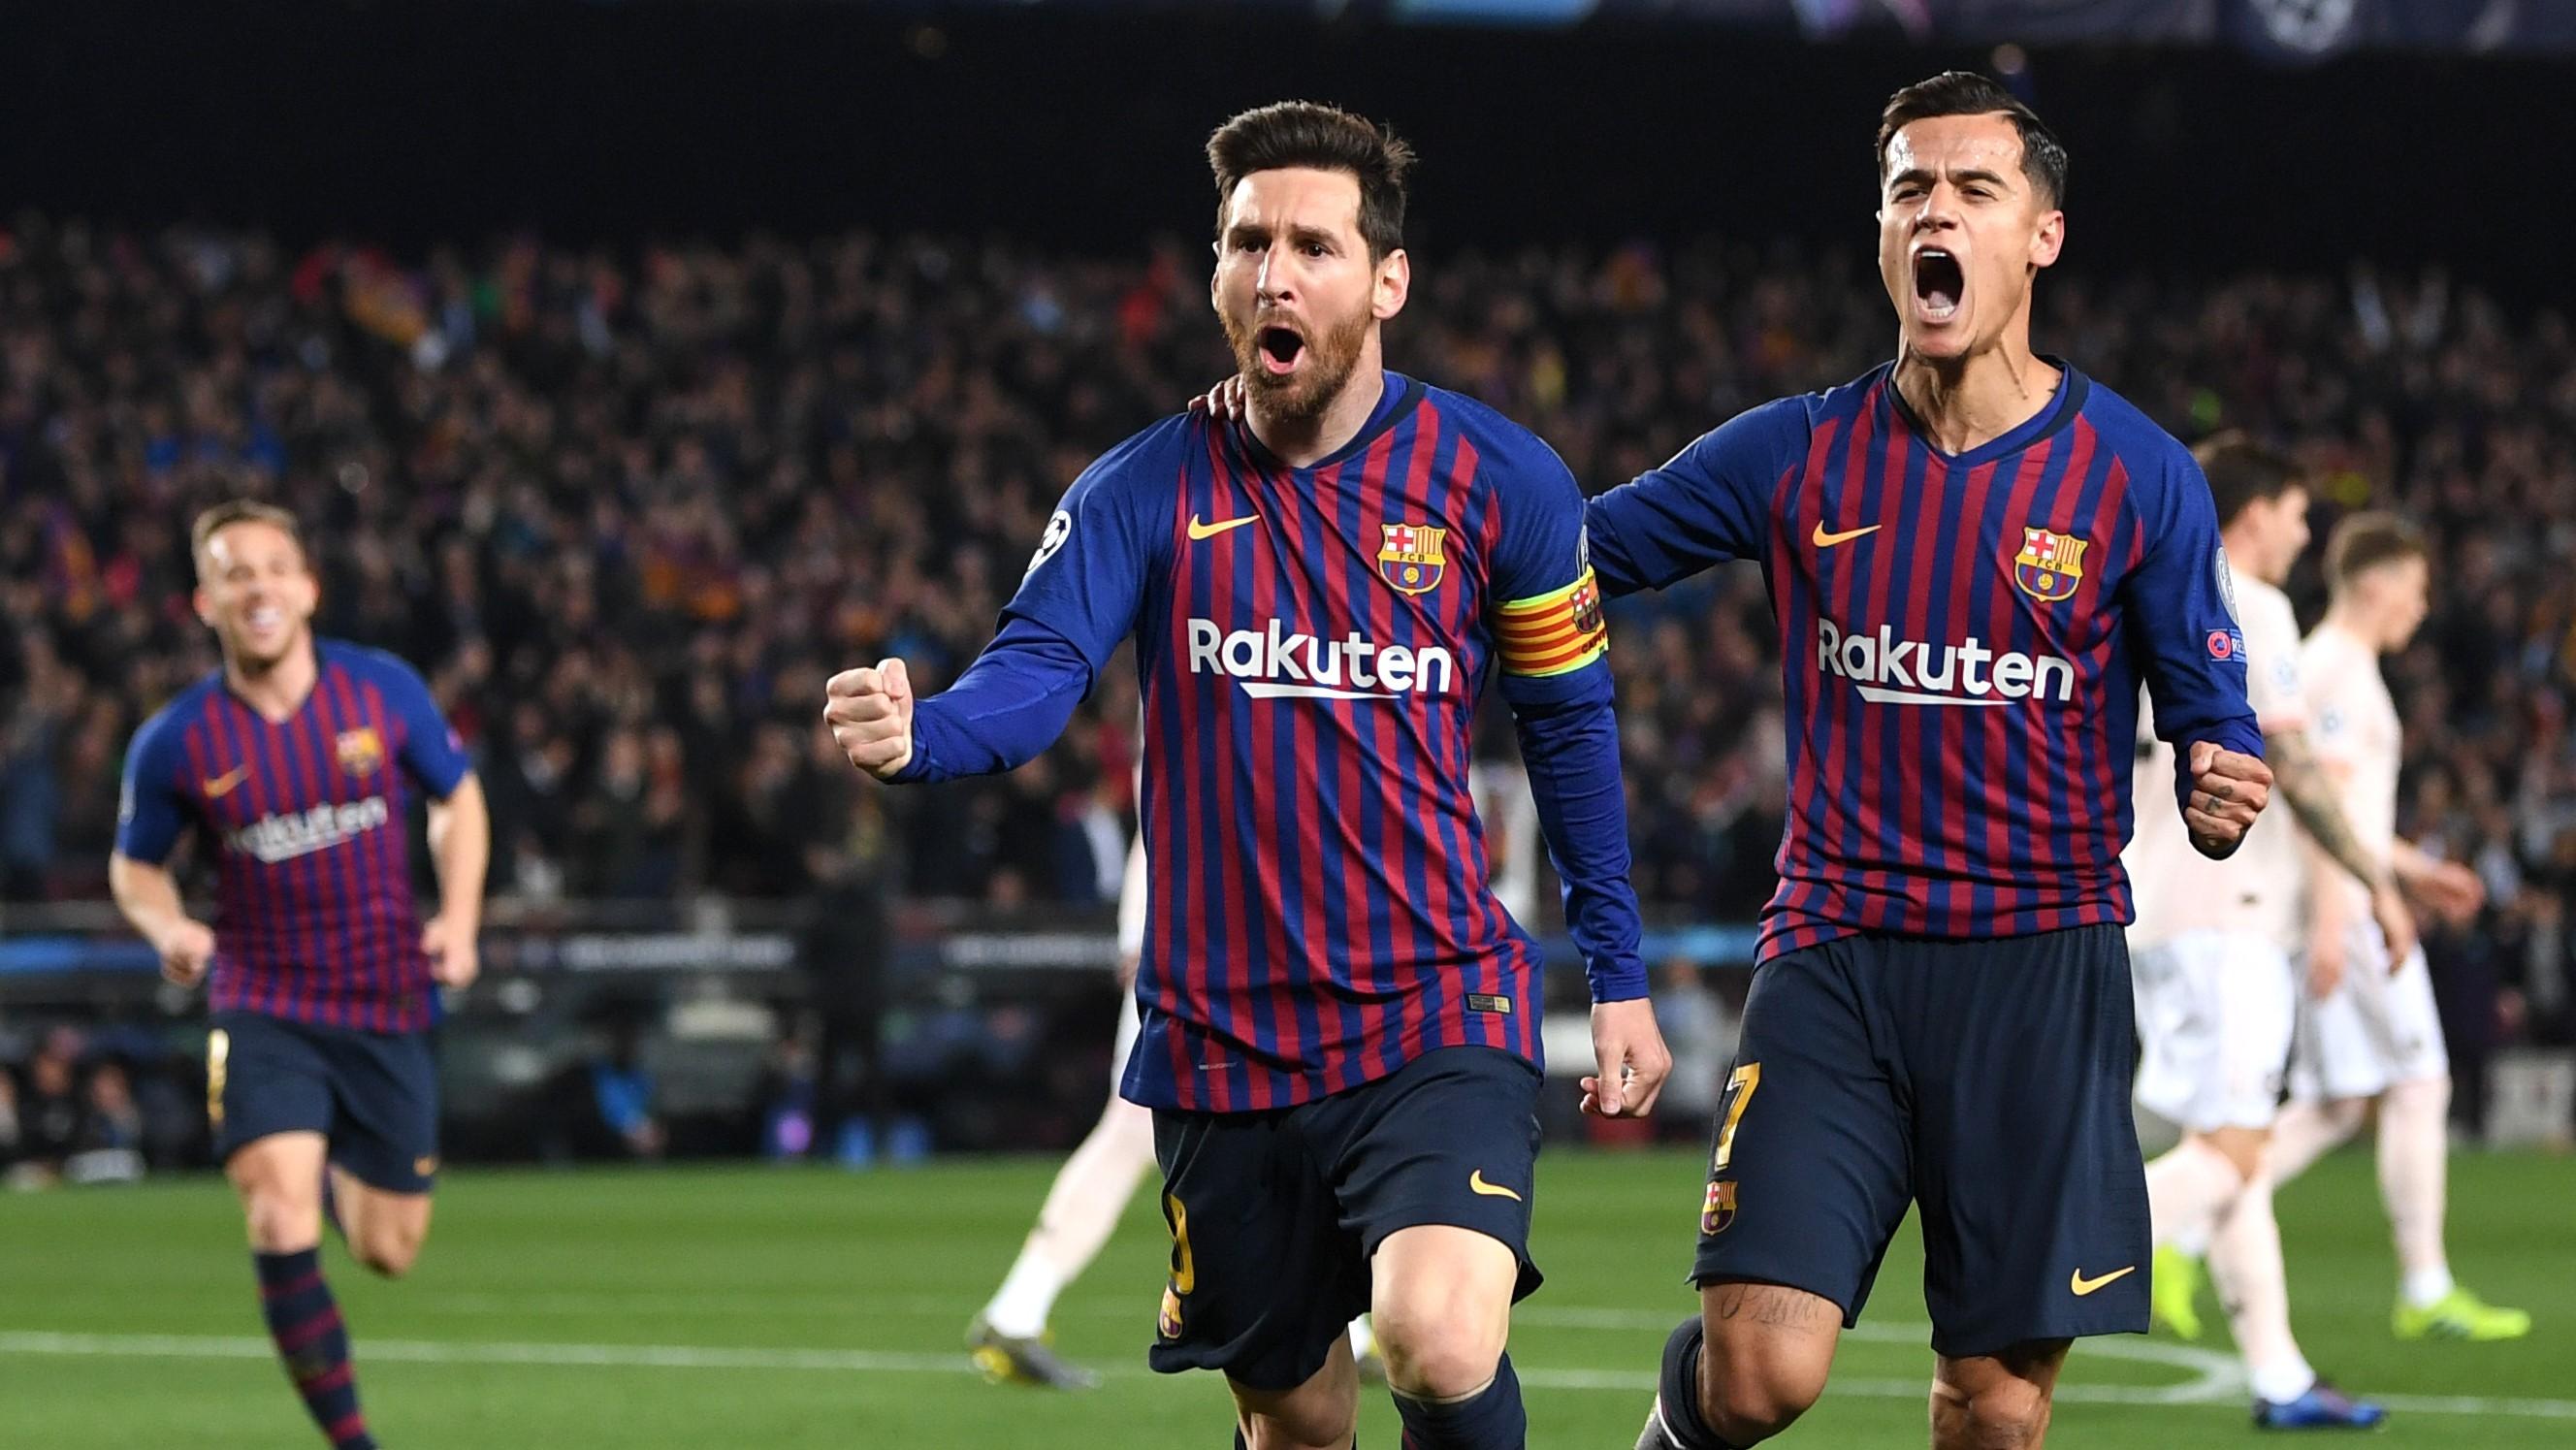 Barcelona V Manchester United FC Laporan Pertandingan 16 04